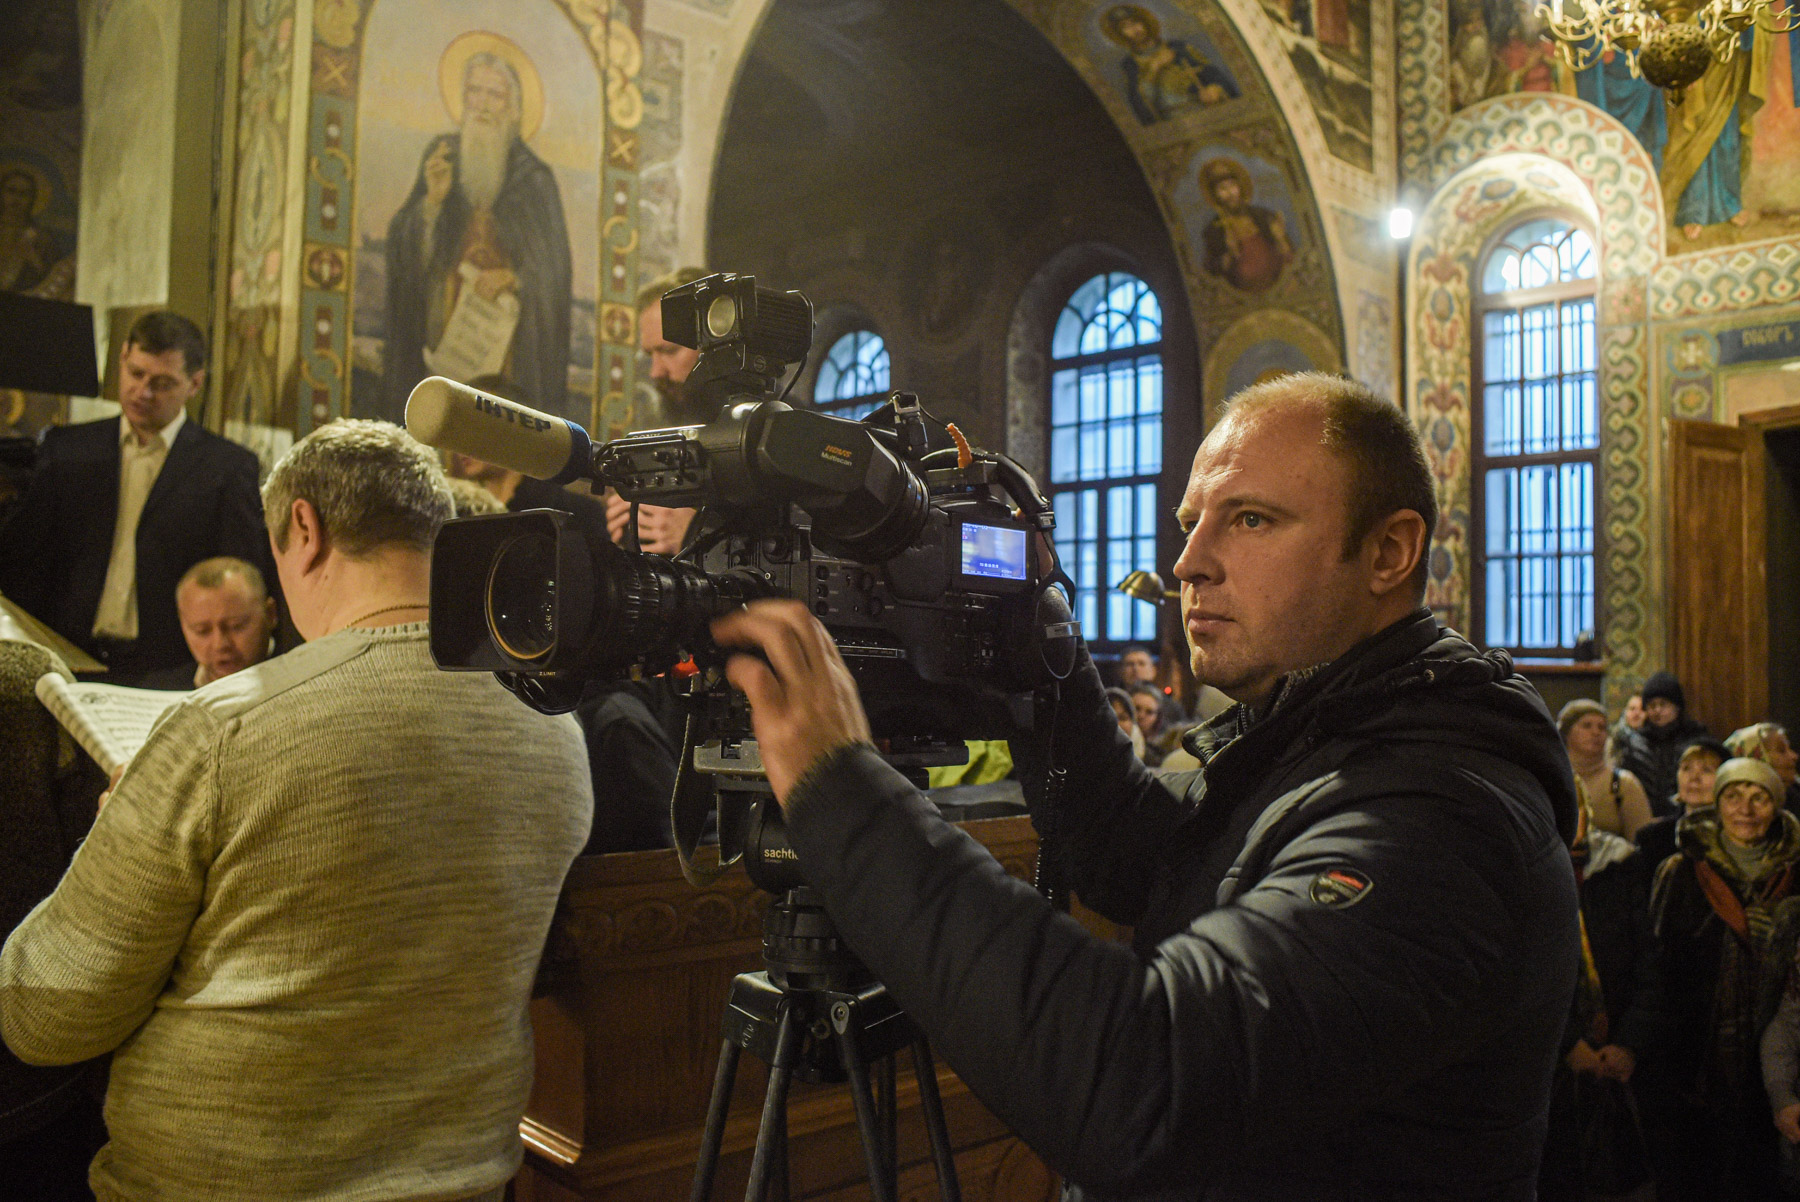 photos of orthodox christmas 0170 2